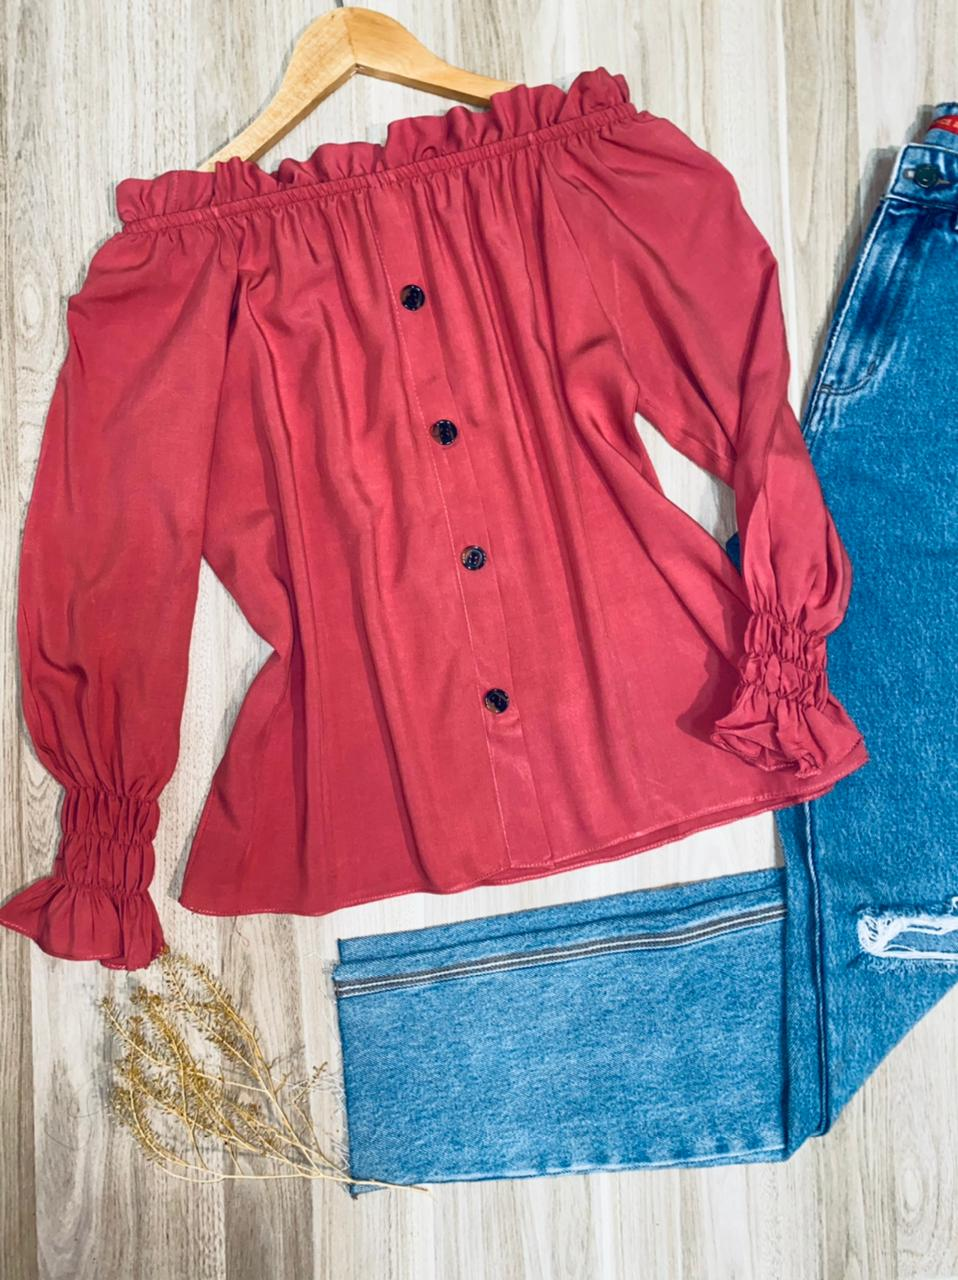 Blusa Ciganinha Manga Longa Fashion Rosa Antigo